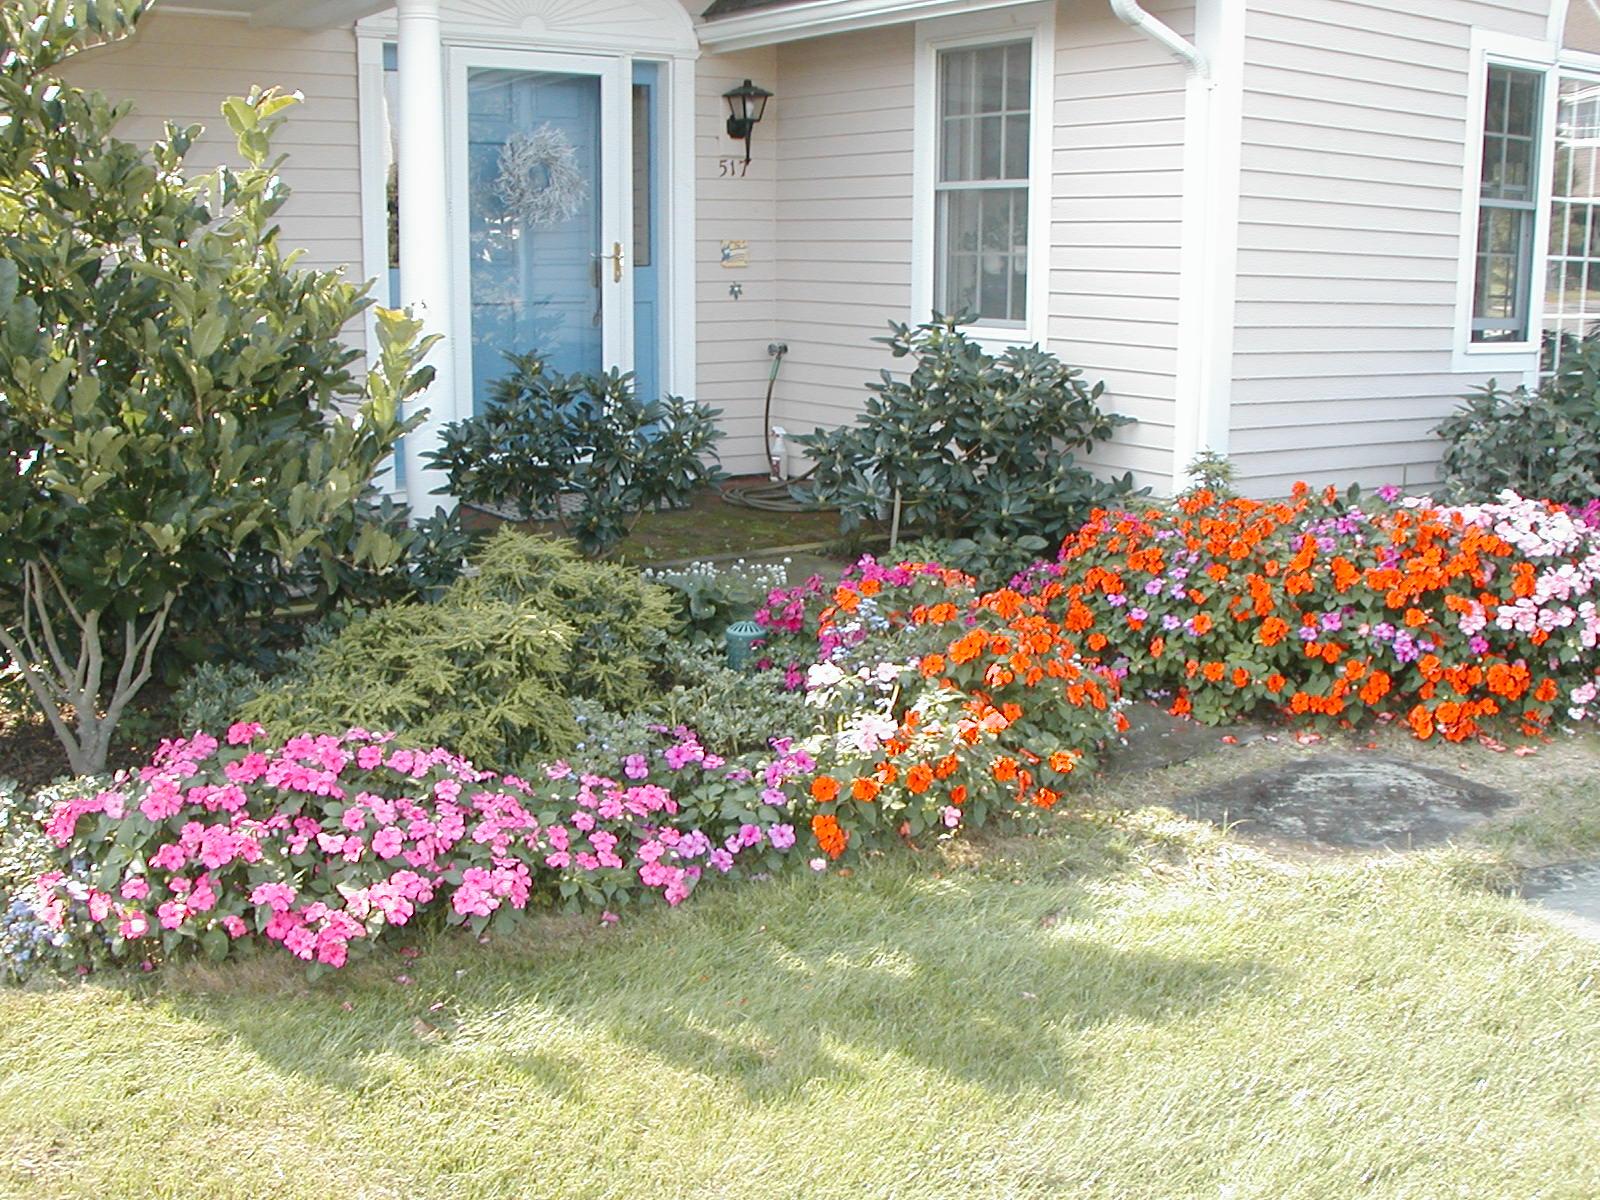 Uncategorized udawimowul for Flower garden landscape